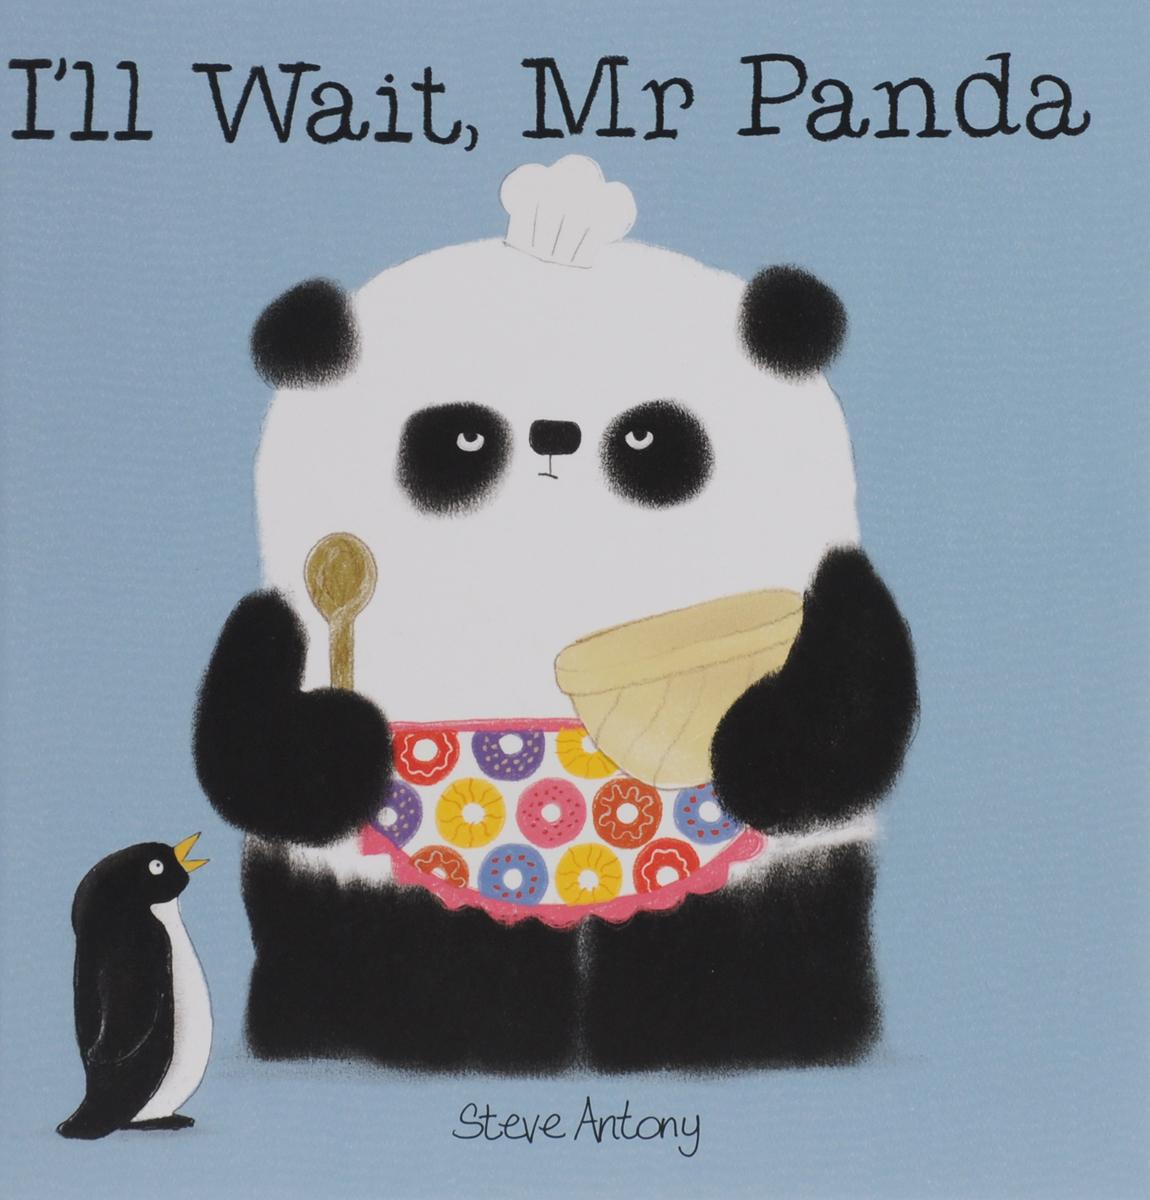 I'll Wait, Mr Panda nina stefanovich tale about littleworm book for kids